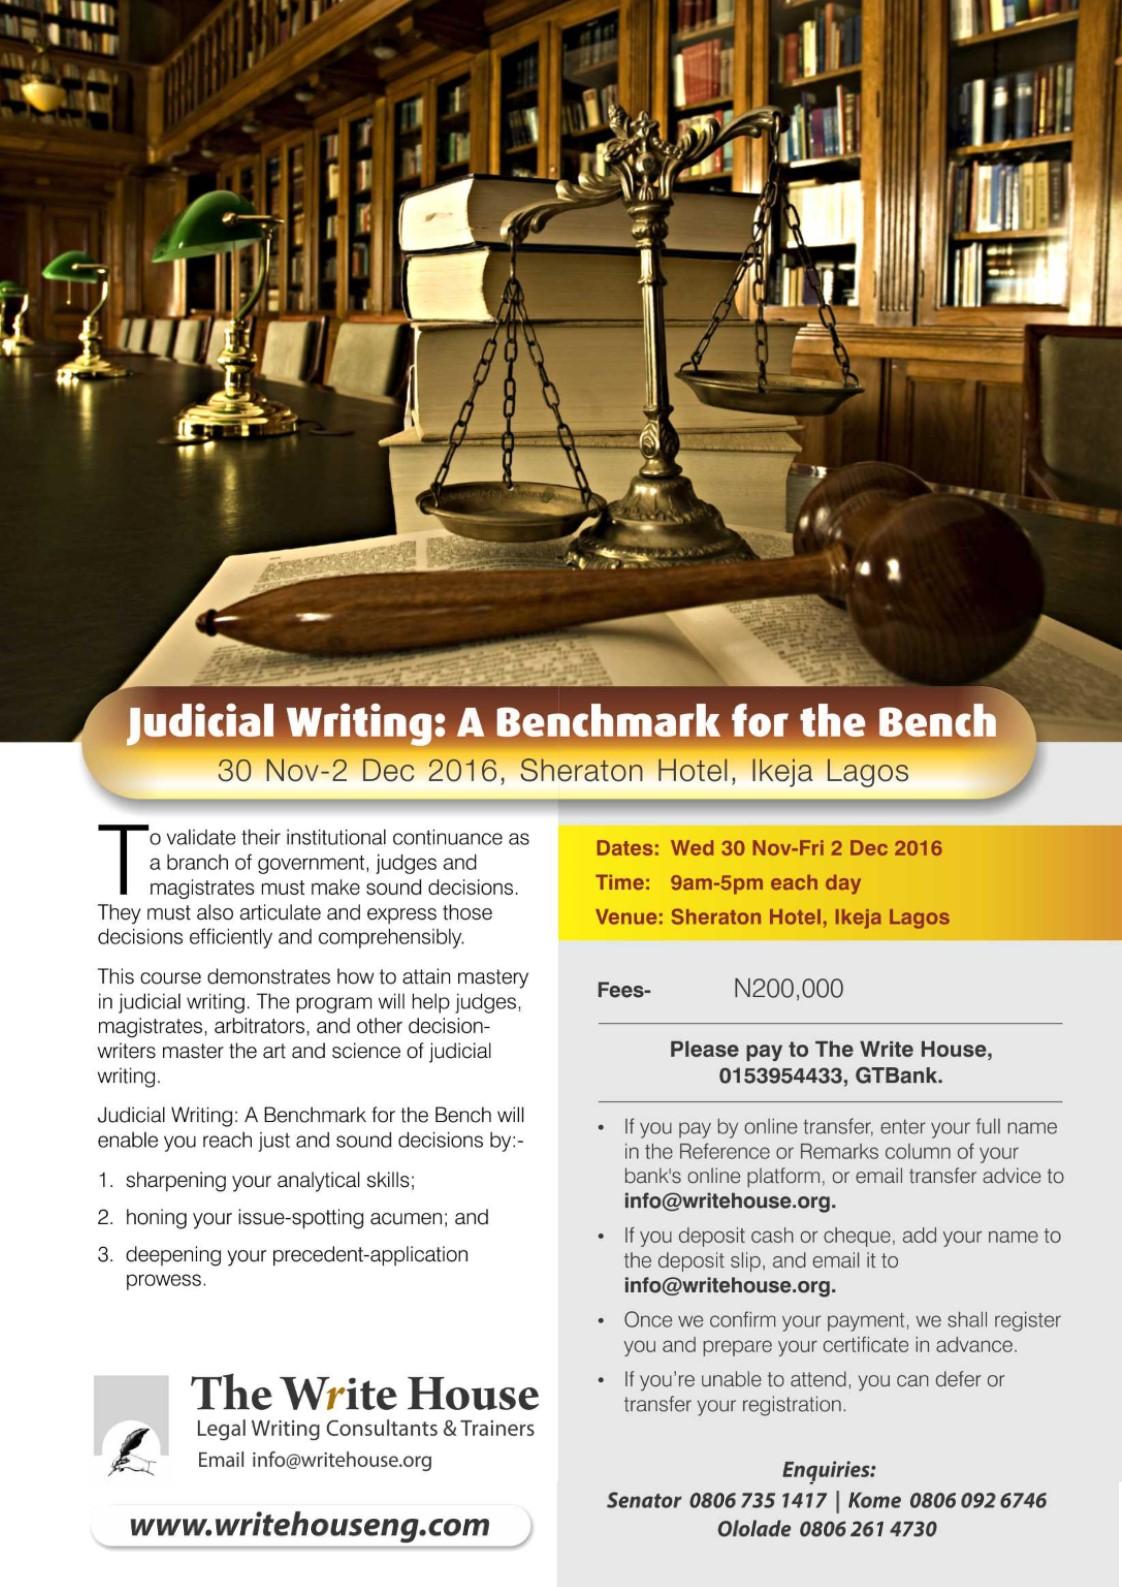 Judicial Writing: A Benchmark for the Bench, 30 Nov-2 Dec 2016, Sheraton Hotel, Ikeja Lagos